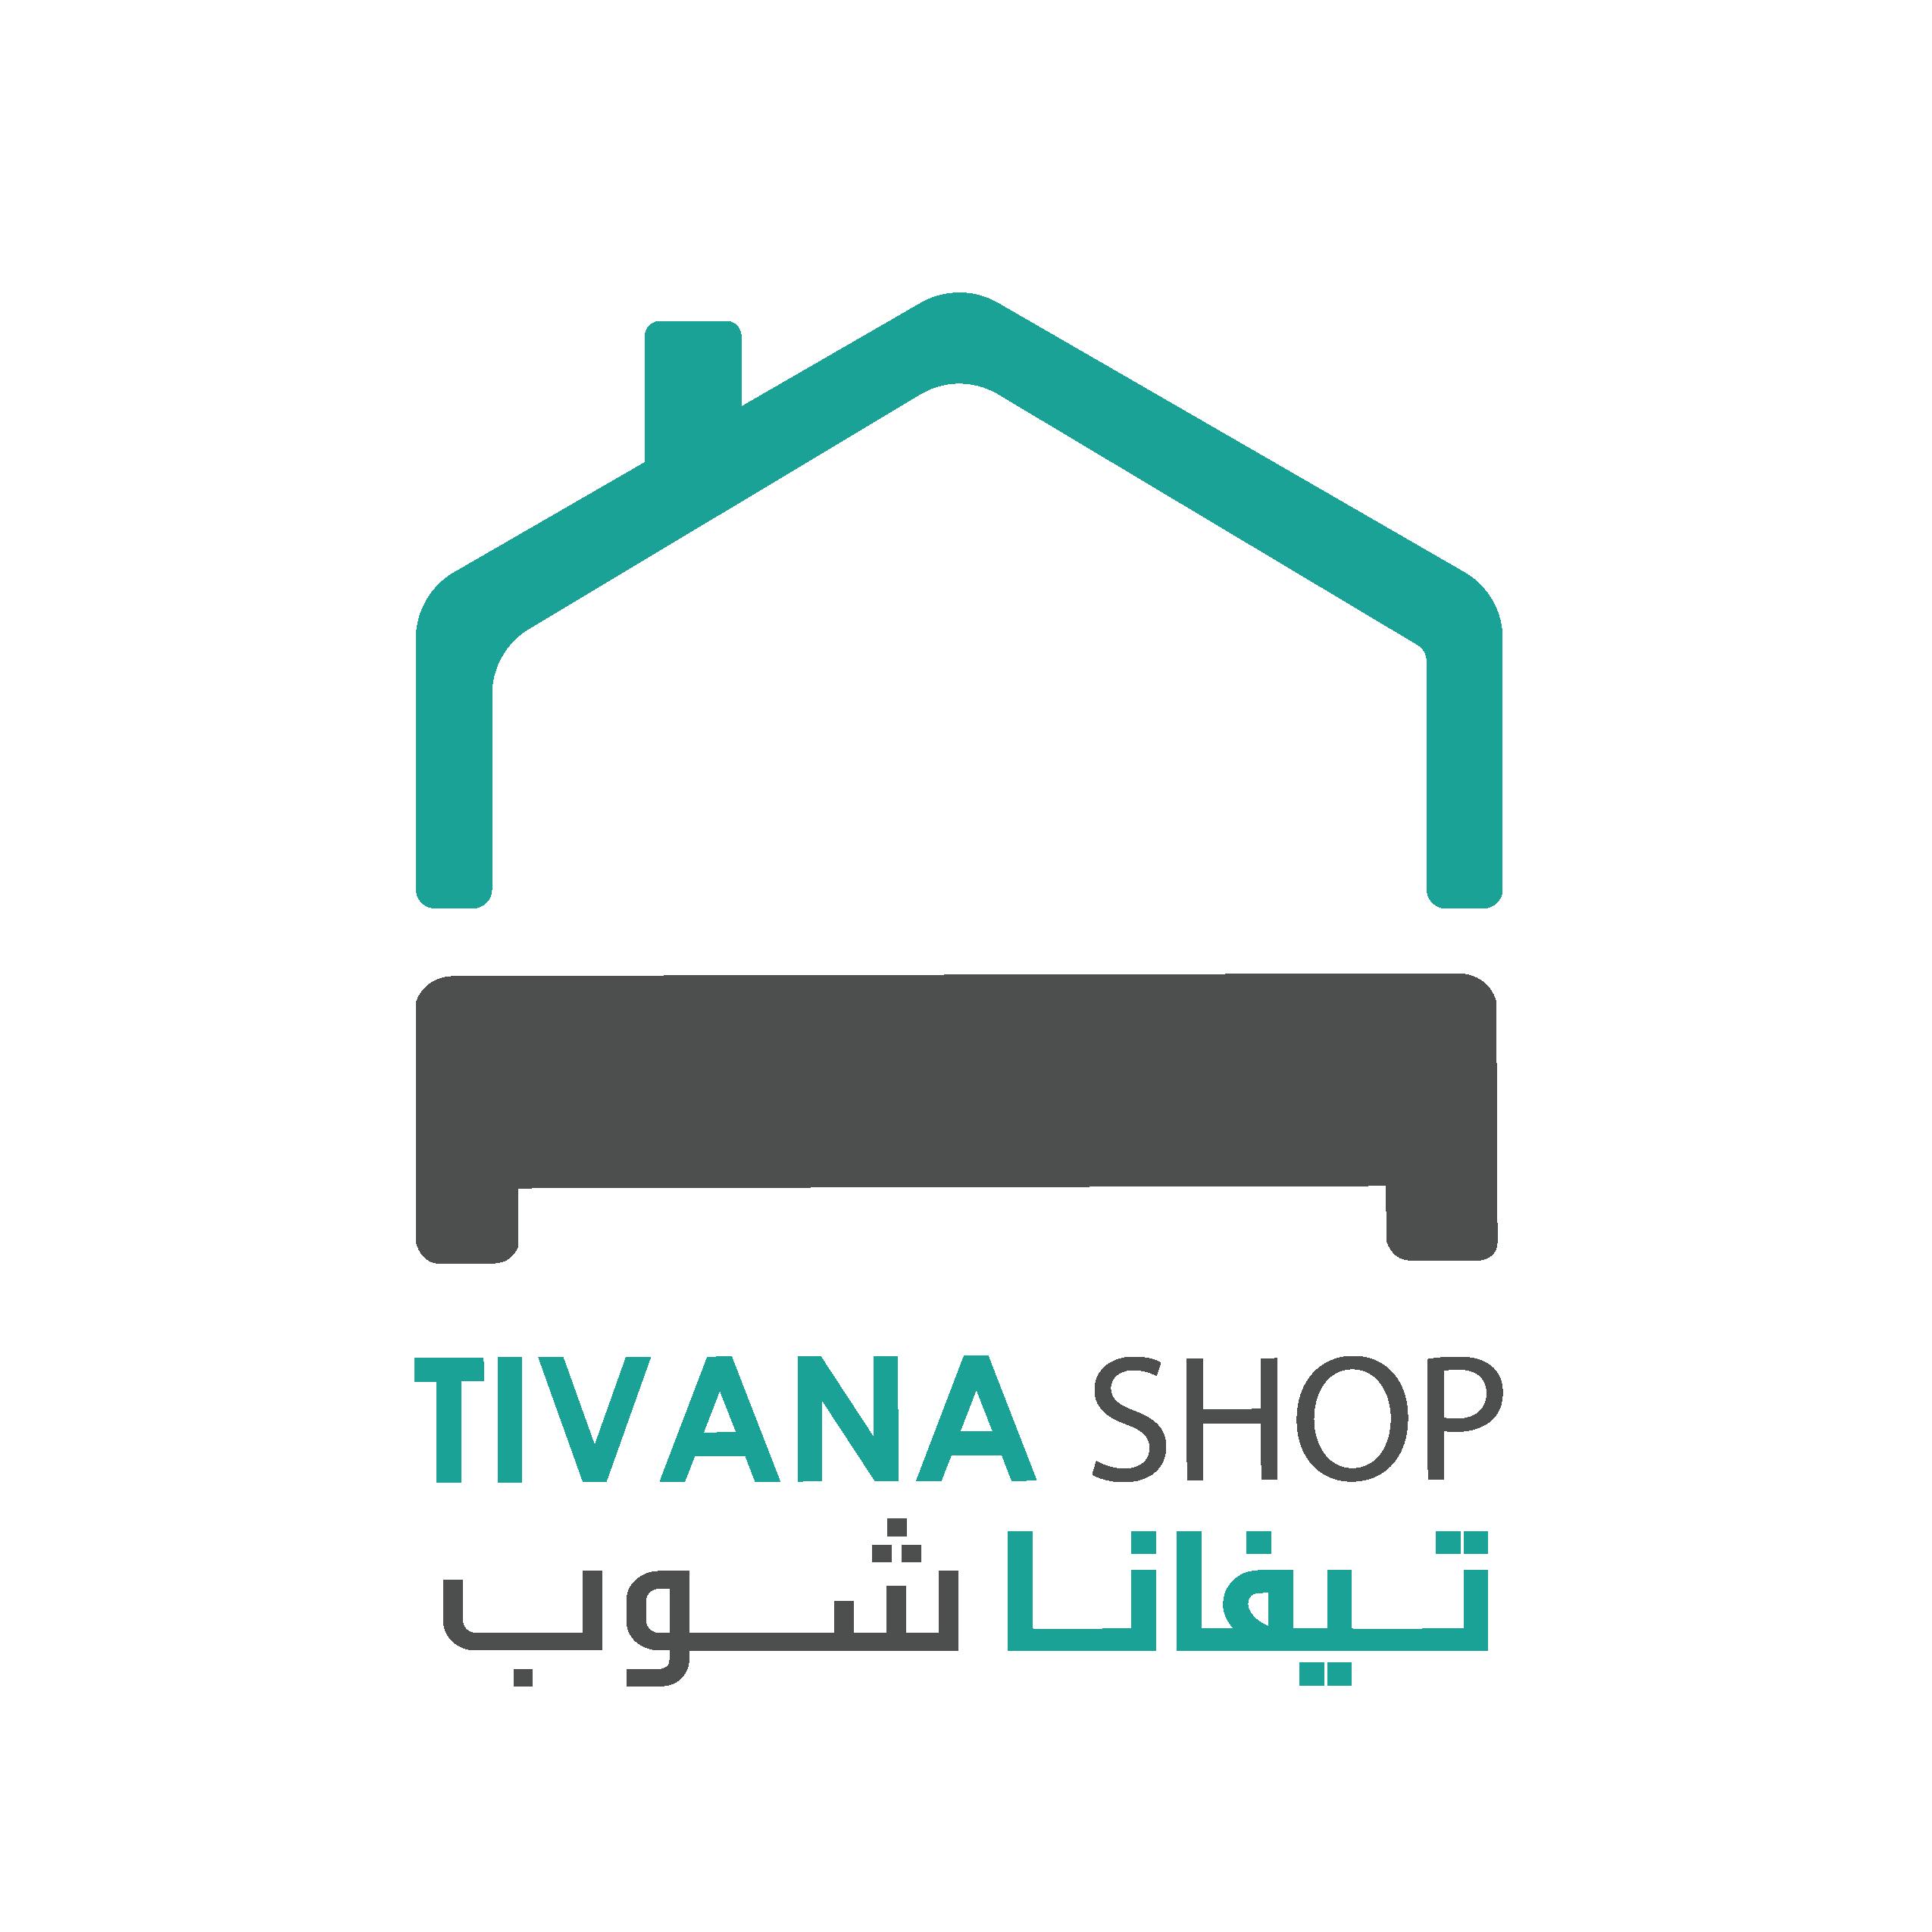 tivanashop | كوايدي